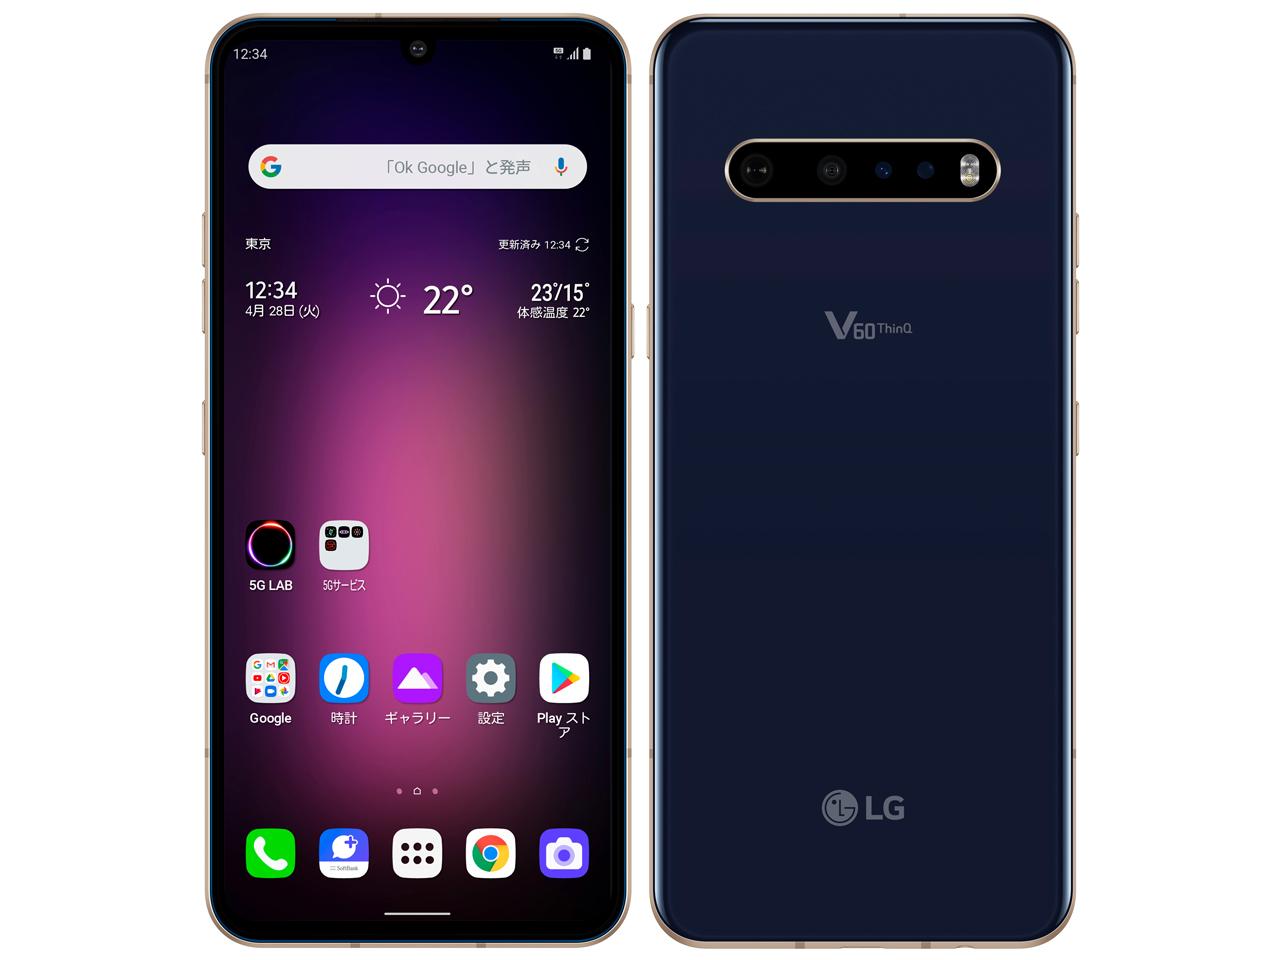 LGエレクトロニクス LG V60 ThinQ 5G 製品画像